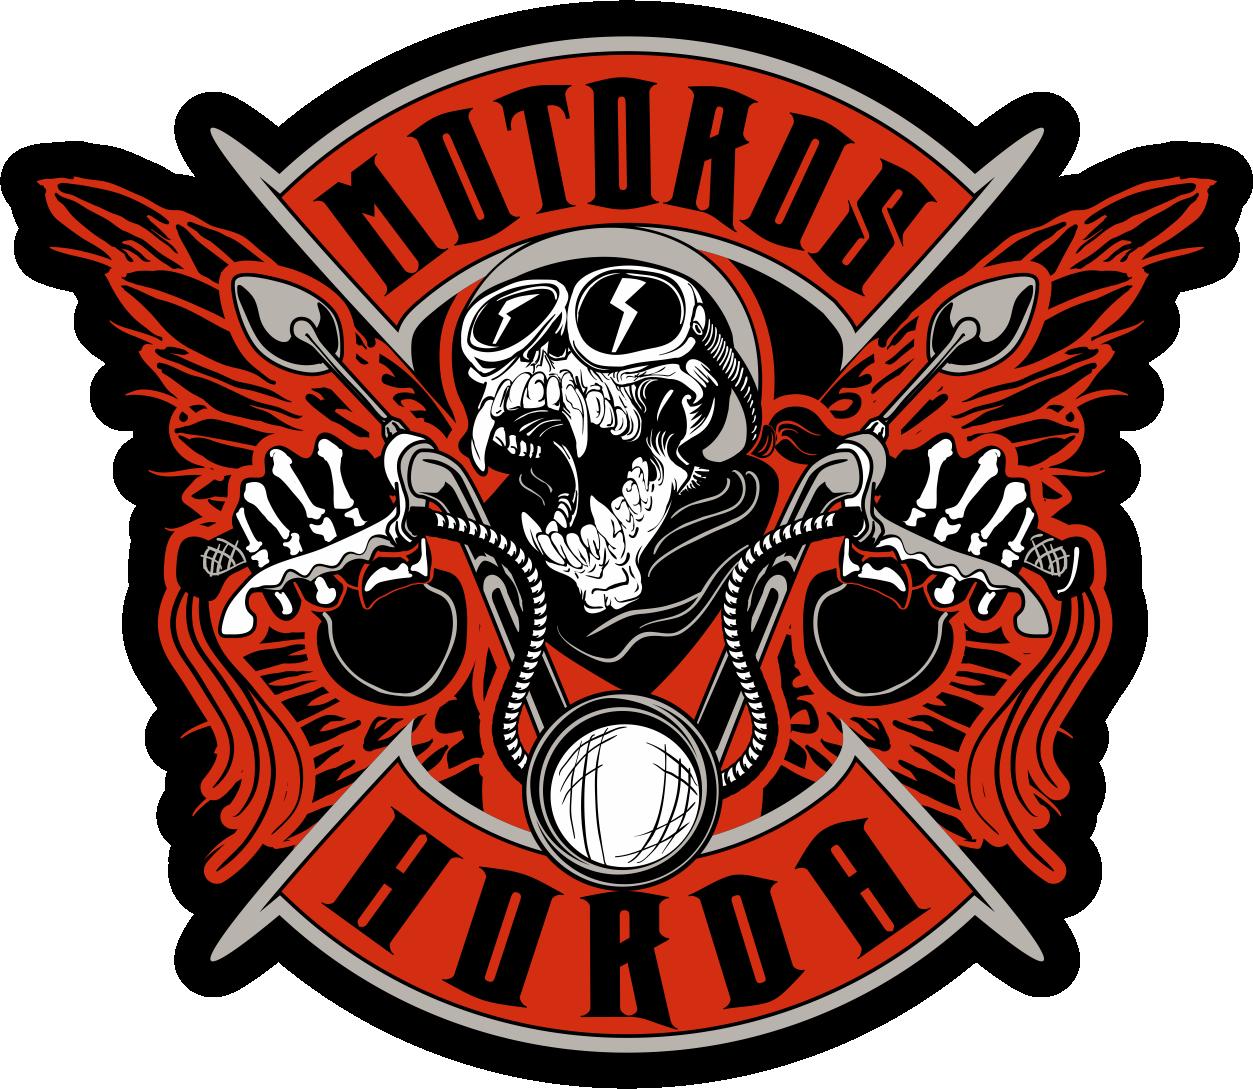 Shark n Roll - Rock- Metal - Webshop – Rock ruházat - Heavy Metál ... 4d4c48be5e